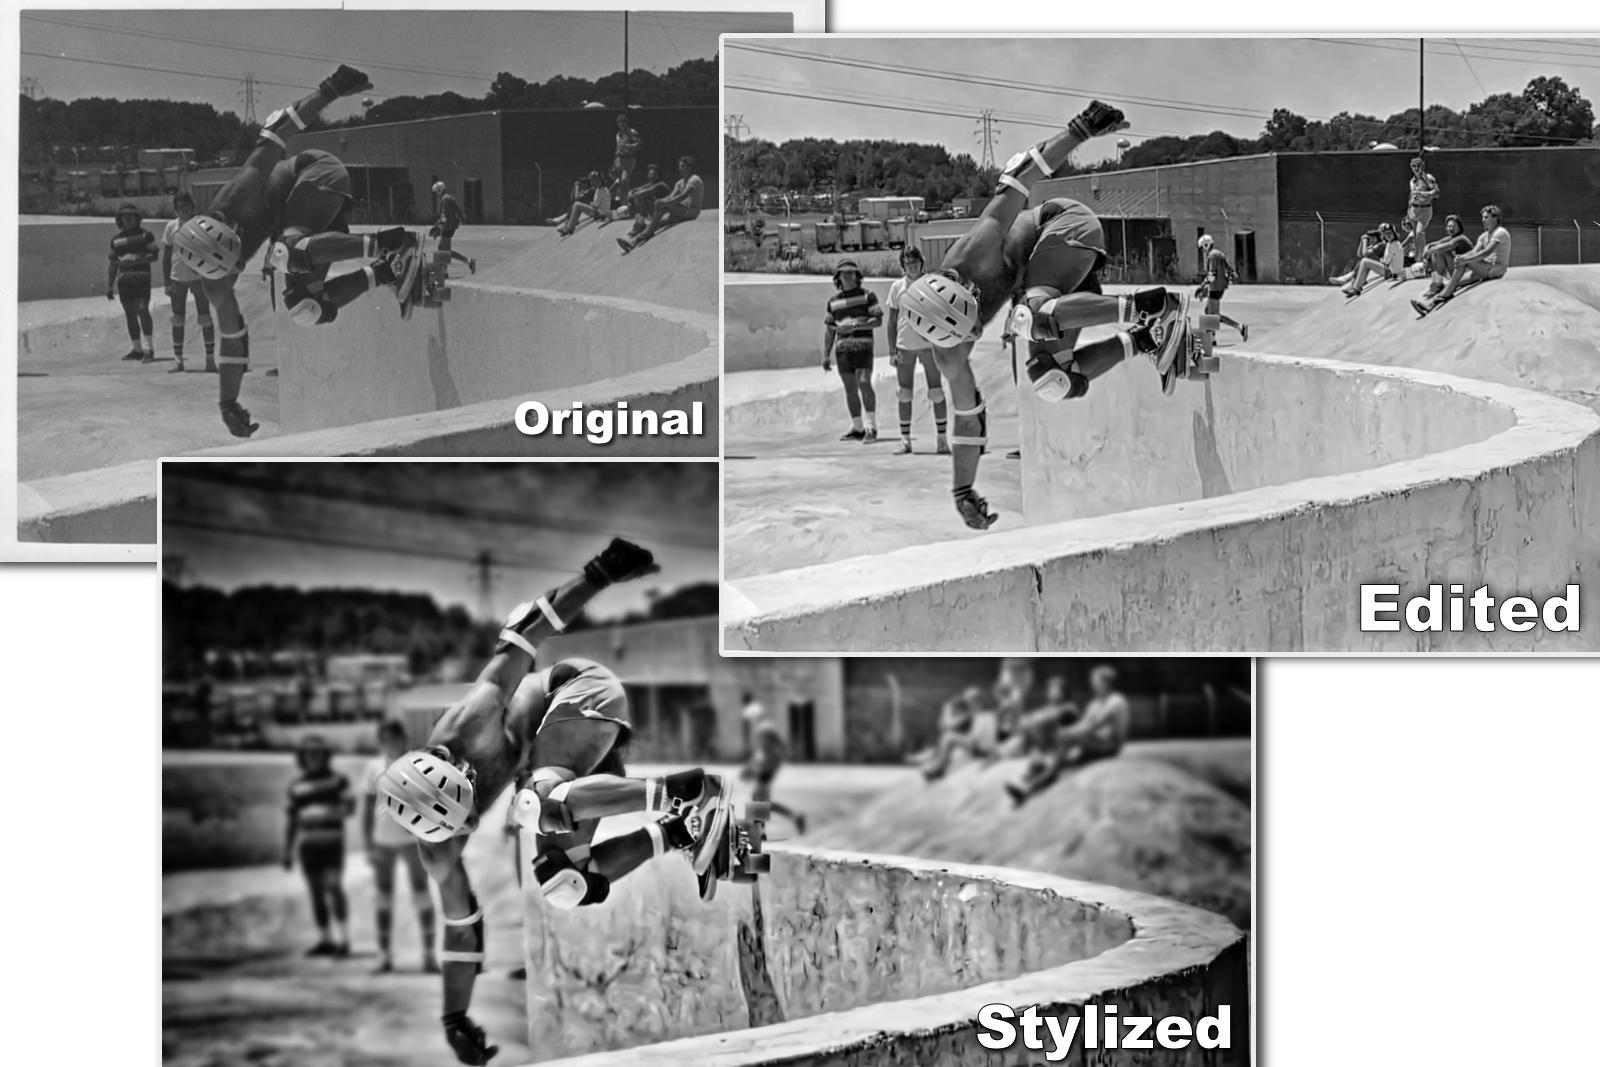 Skateboard Photo Restoration